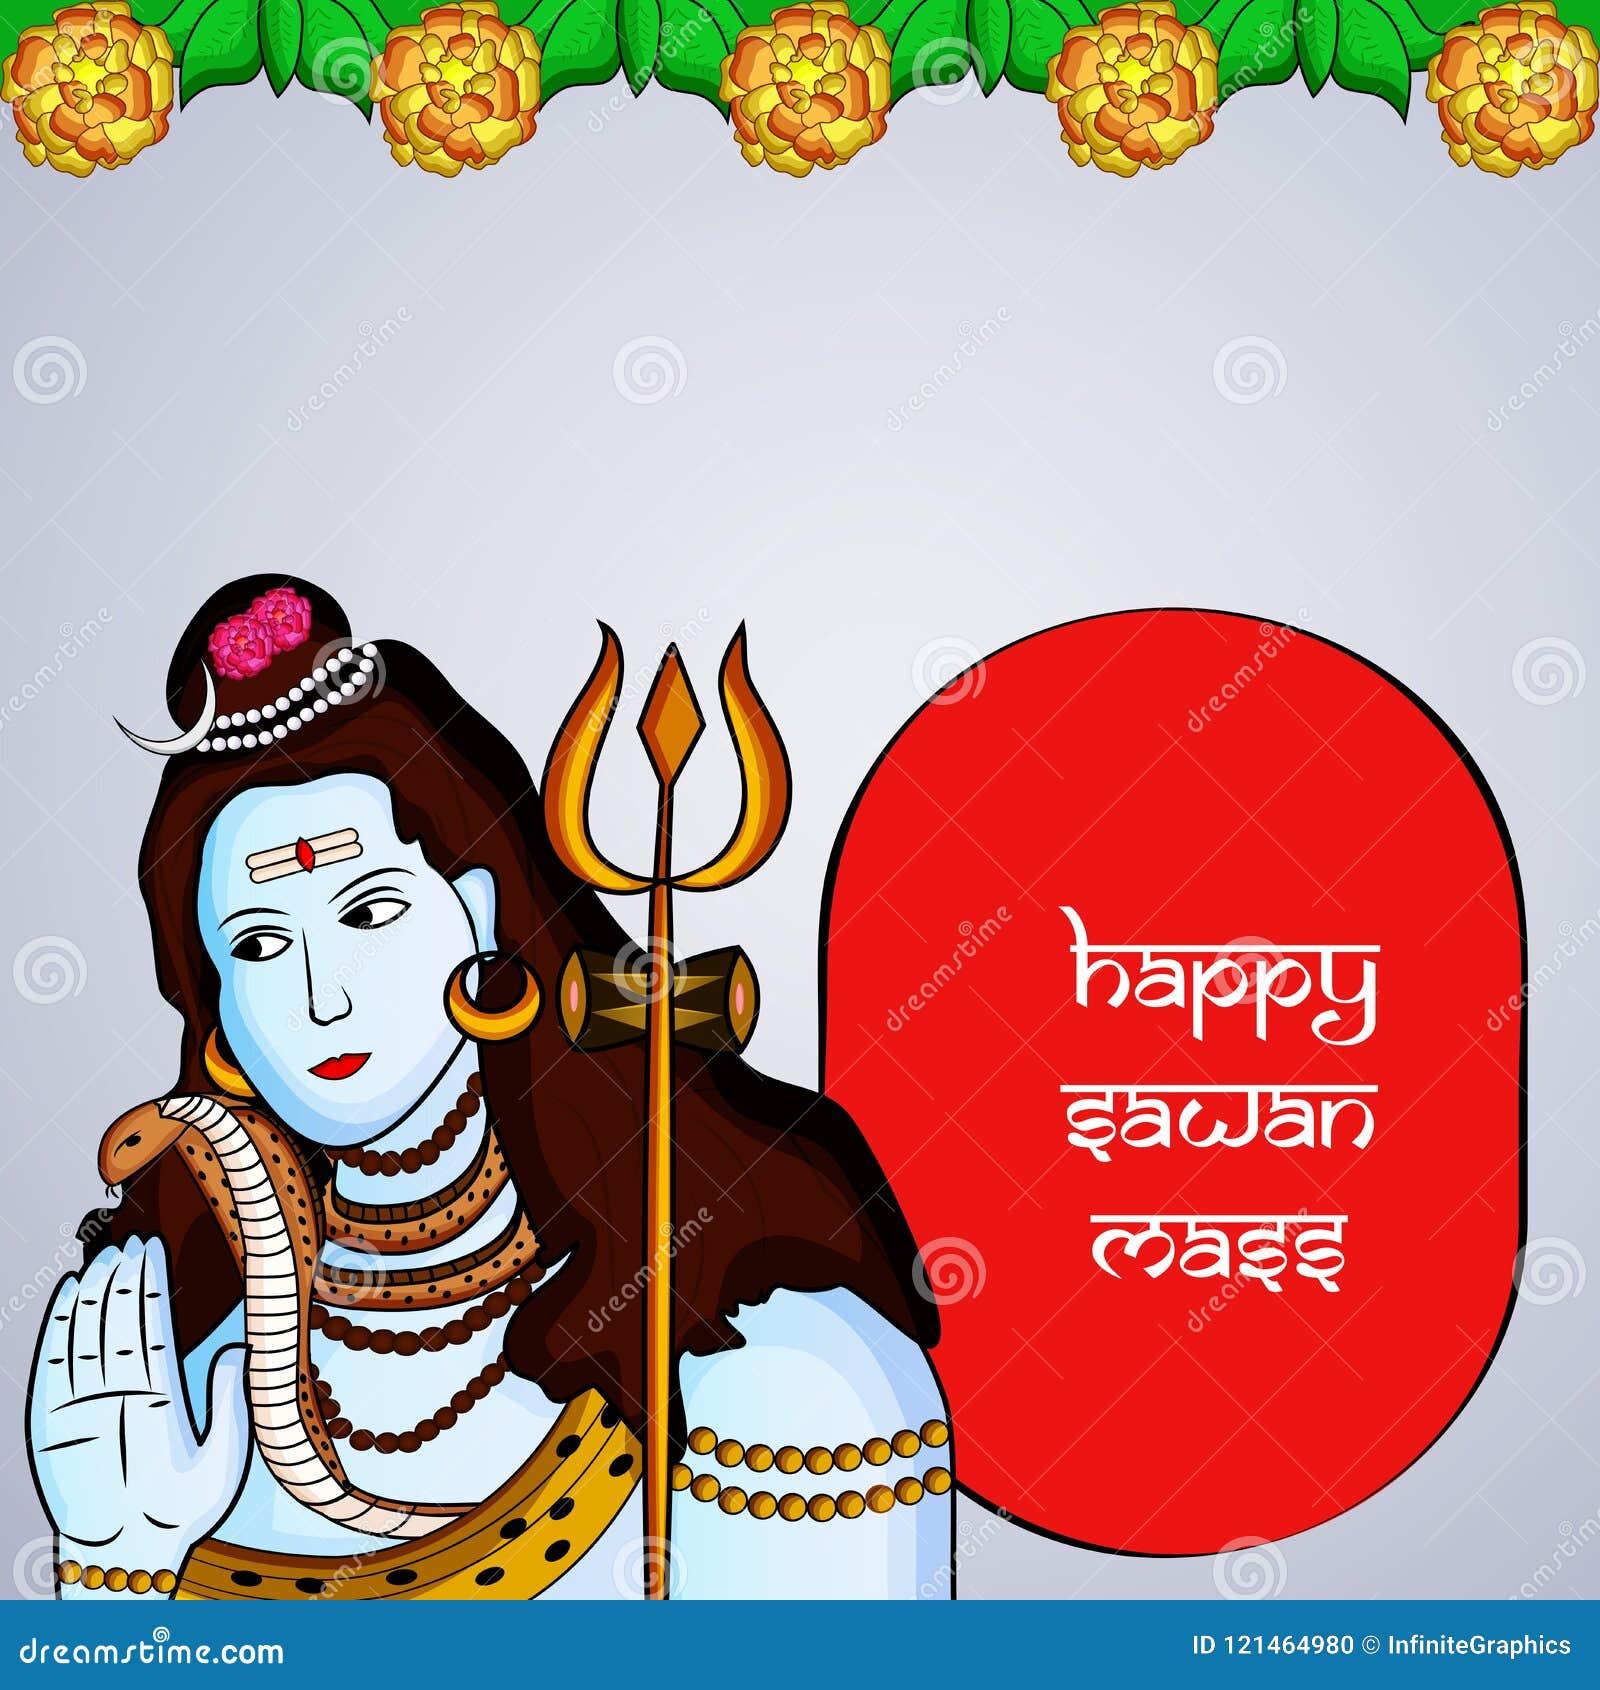 Illustration hindischer Festival Sawan-Masse